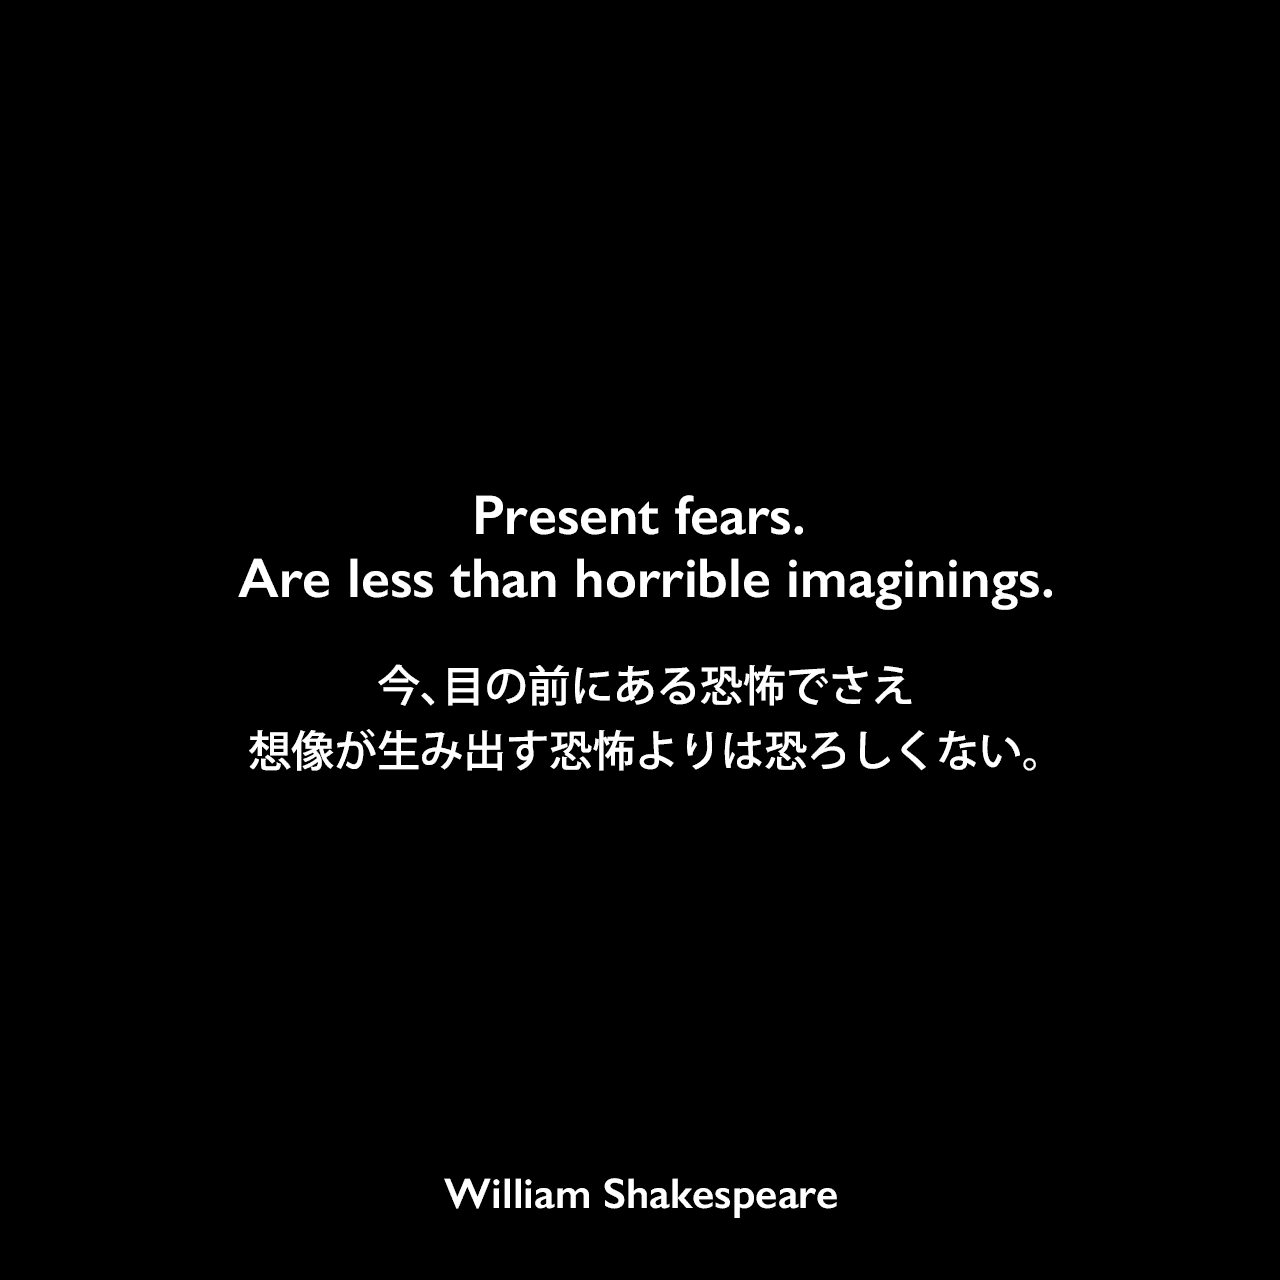 Present fears. Are less than horrible imaginings.今、目の前にある恐怖でさえ想像が生み出す恐怖よりは恐ろしくない。William Shakespeare